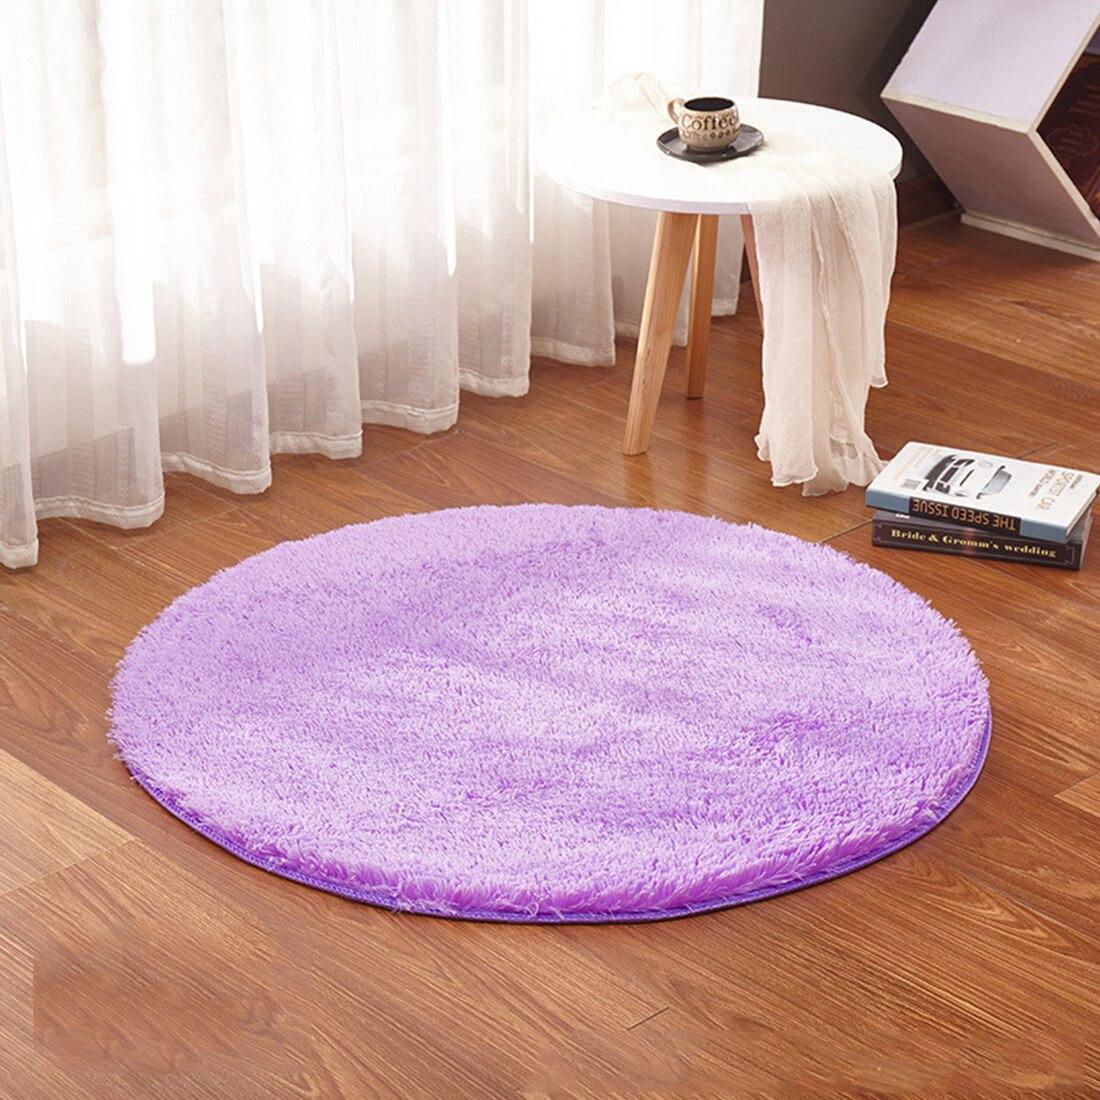 Multicolor Soft Shaggy Area Round Rug Living Room Carpet Bedroom Floor Mat Carpet Diameter 30cm-160cm Home Decoration